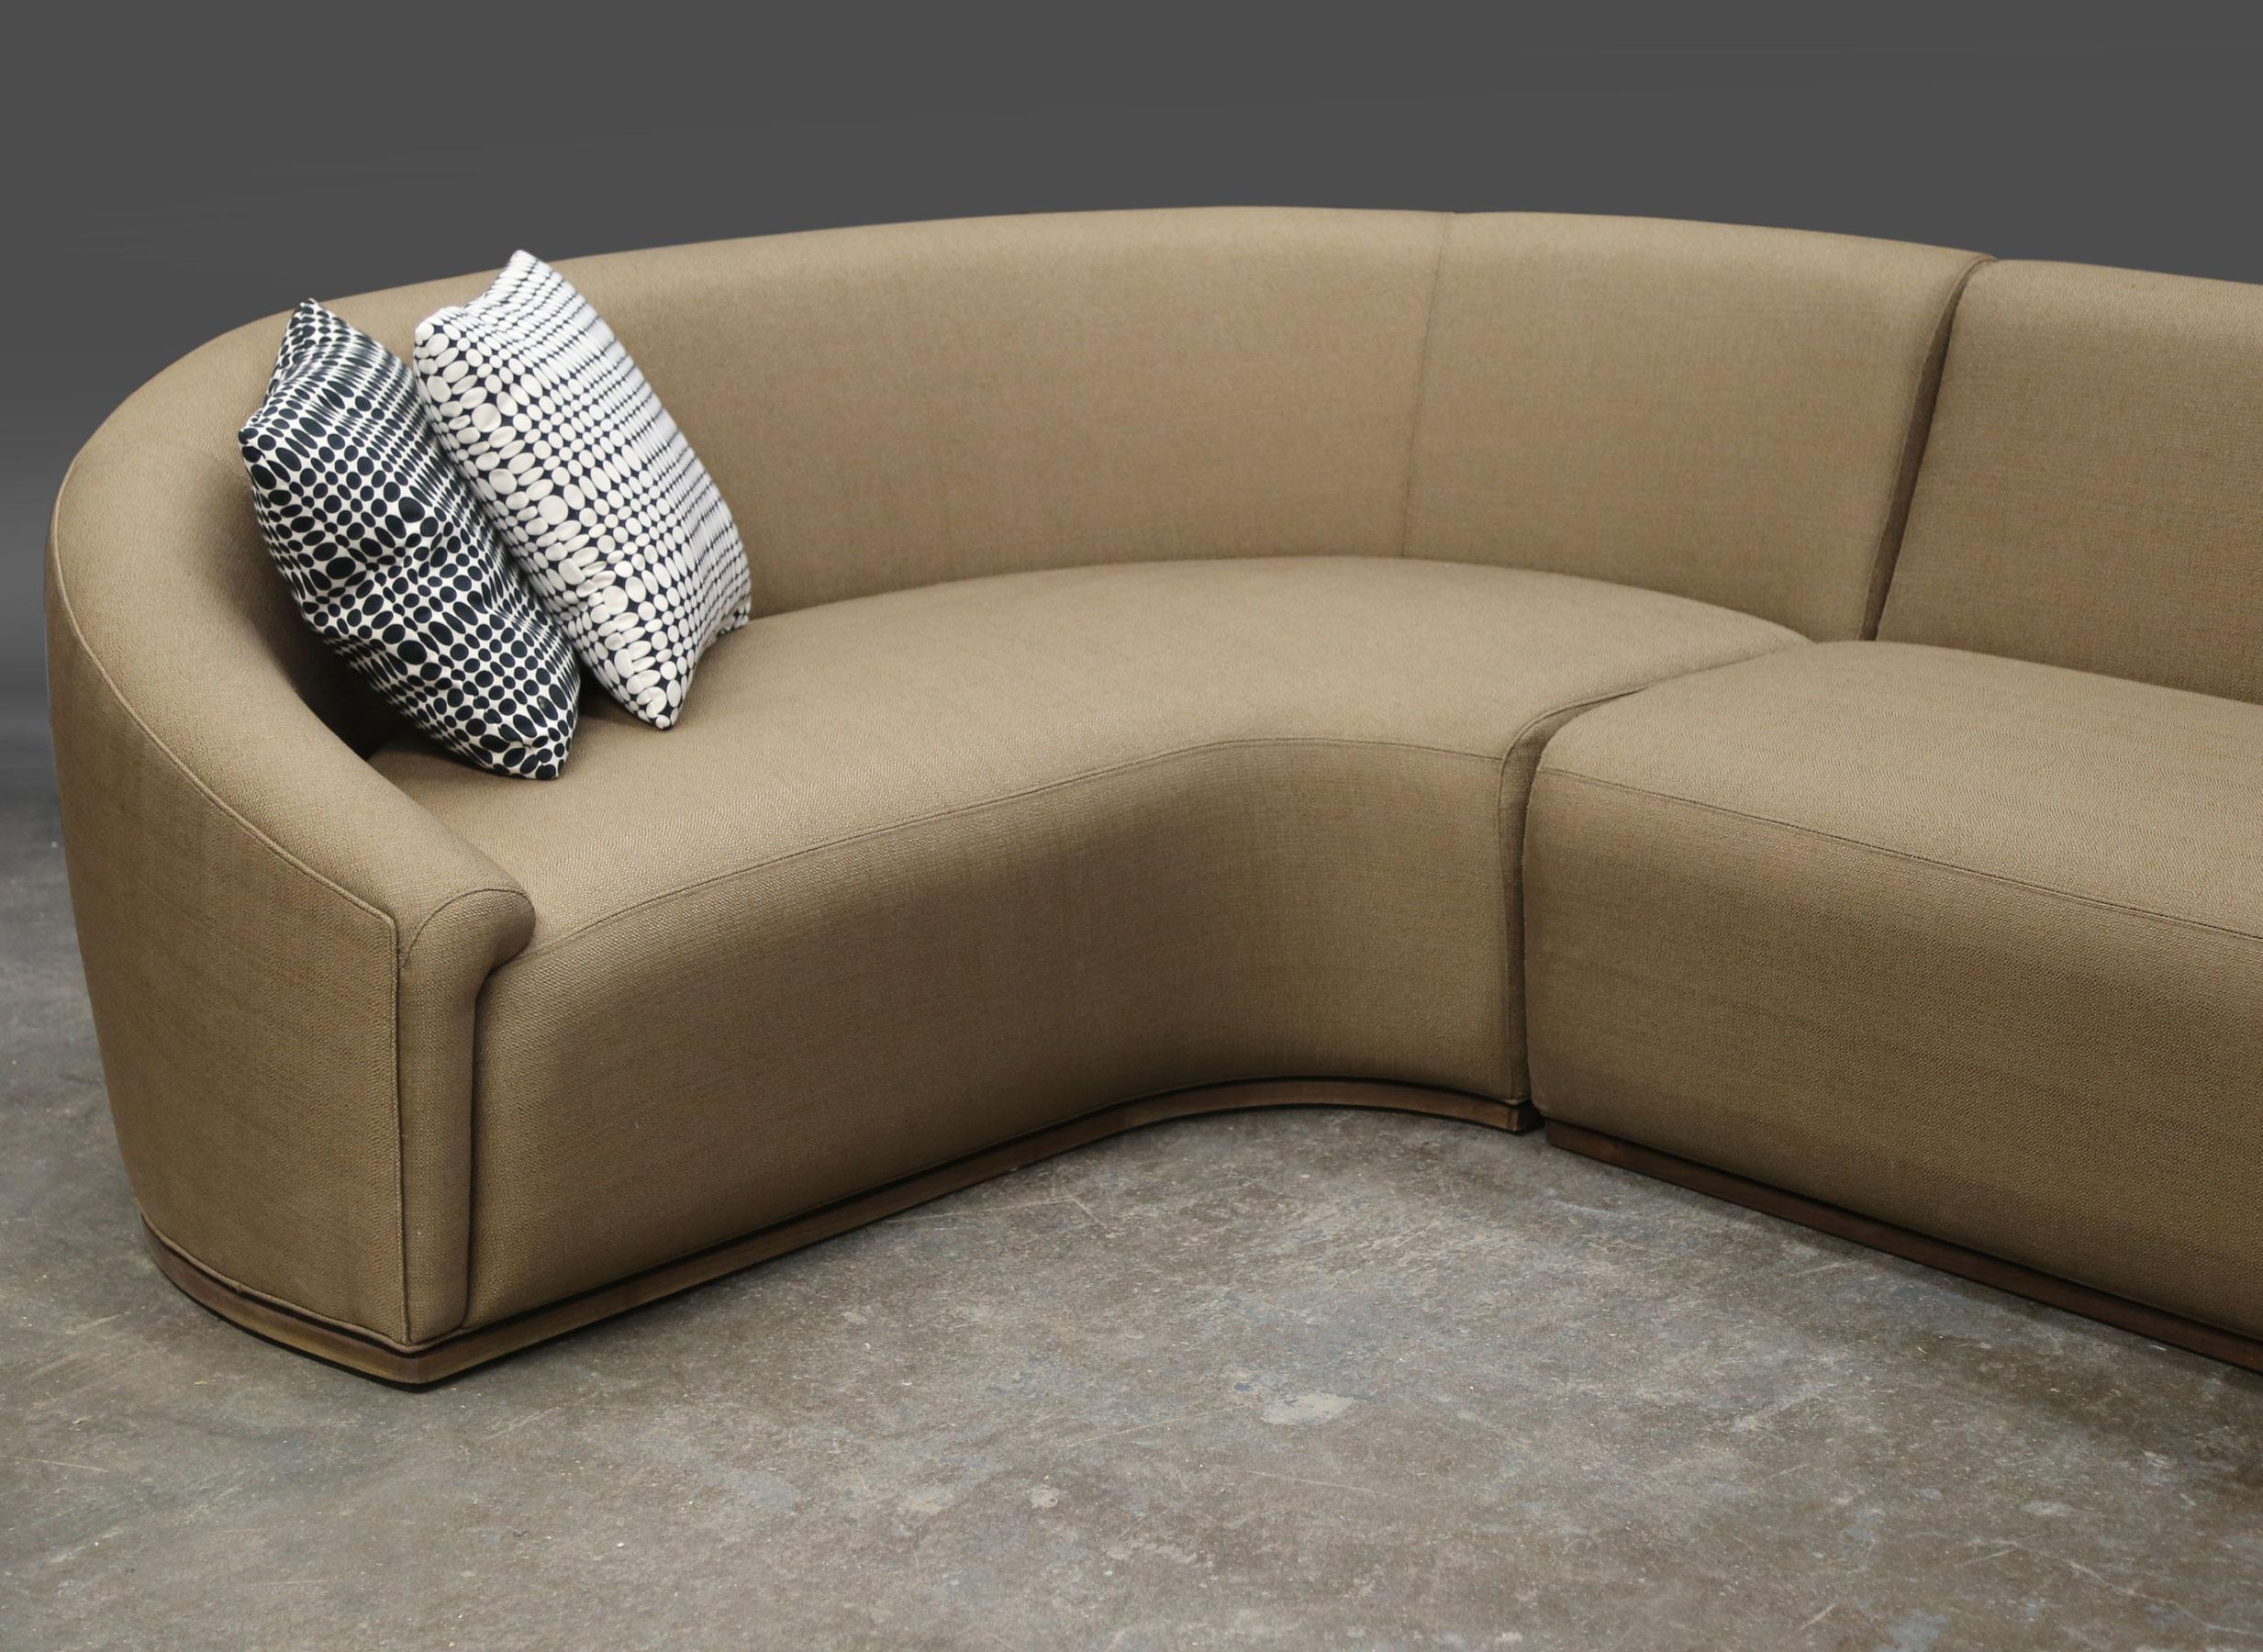 Baasche Sectional Sofa